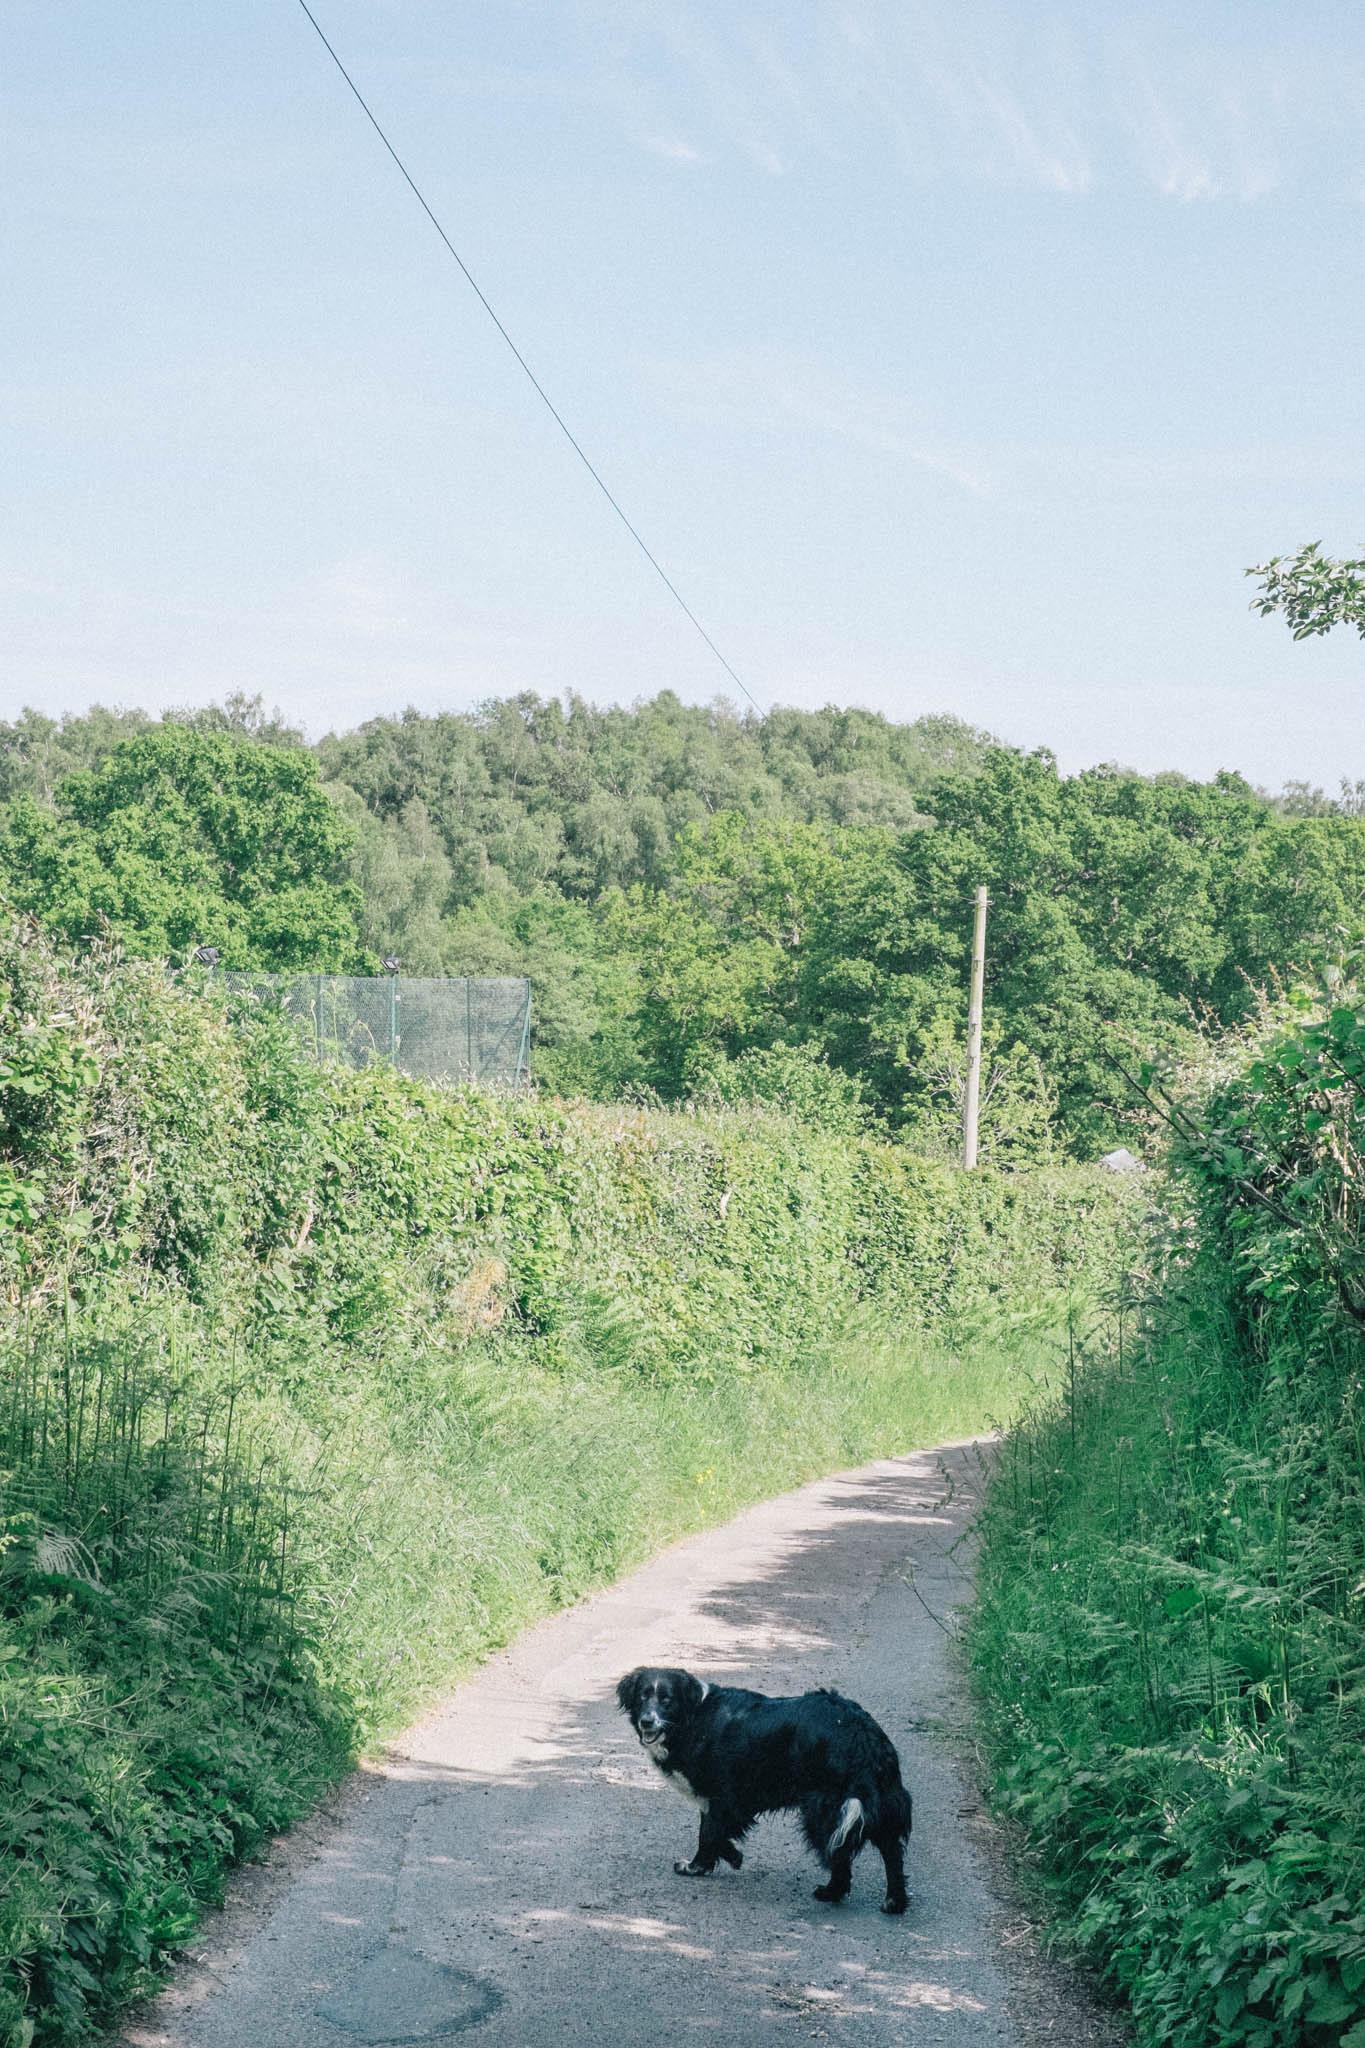 Photography by Emma Gutteridge for Retreat blog.